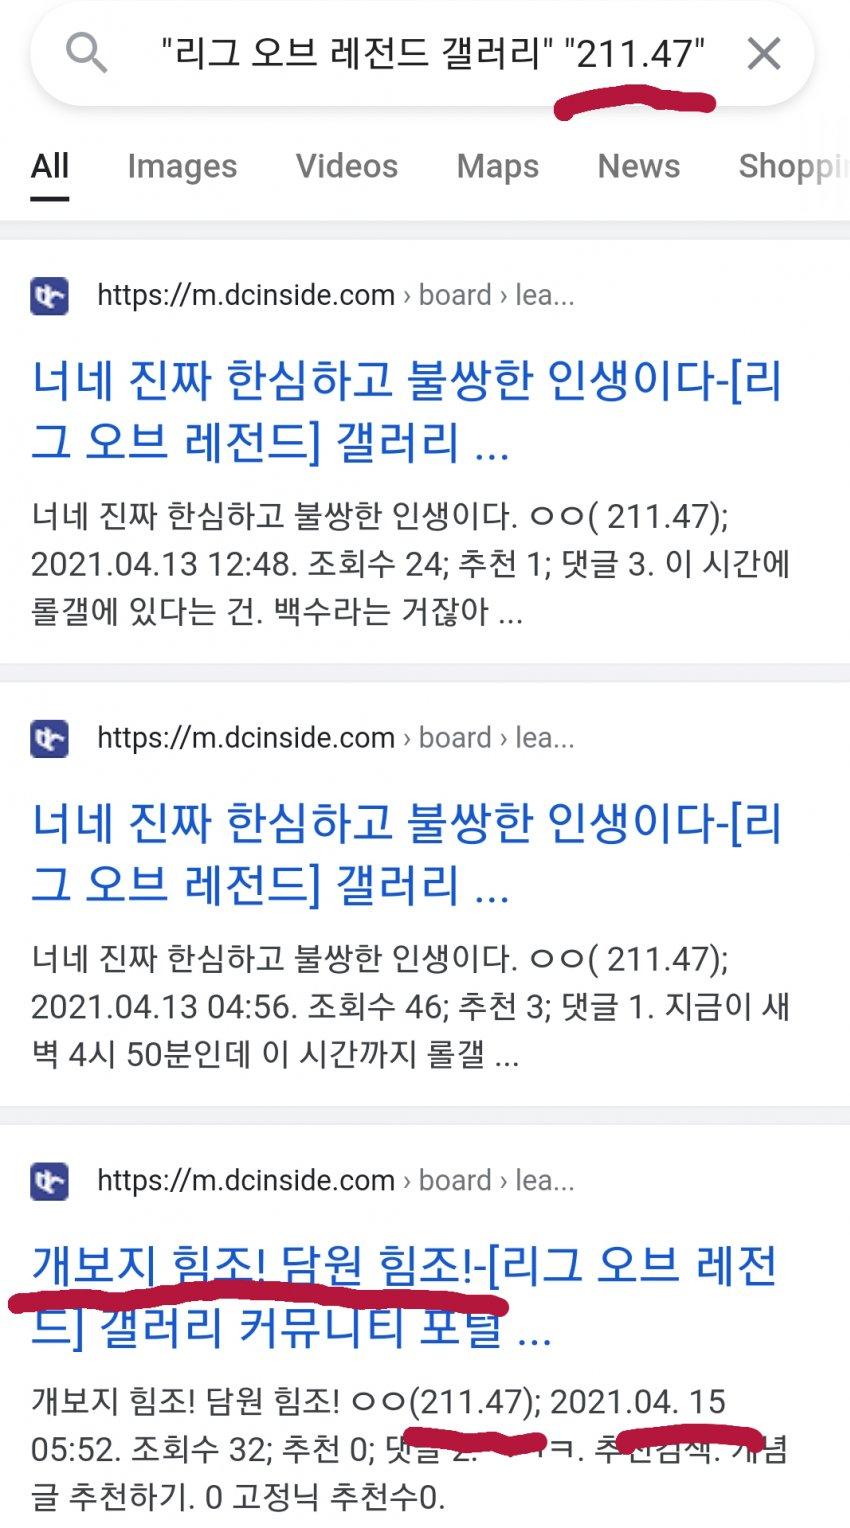 viewimage.php?id=21b8d121f0d737a062bad1b018d53769&no=24b0d769e1d32ca73cec81fa11d02831ce3cef1b9542c00ceb084720f8a782315bbee6022b02d4d63657f83a2b989148deea995ab62082a3f822b033655f02689d0b8526e2782f77ffe5d6a1833a101948f325130869a28d0778